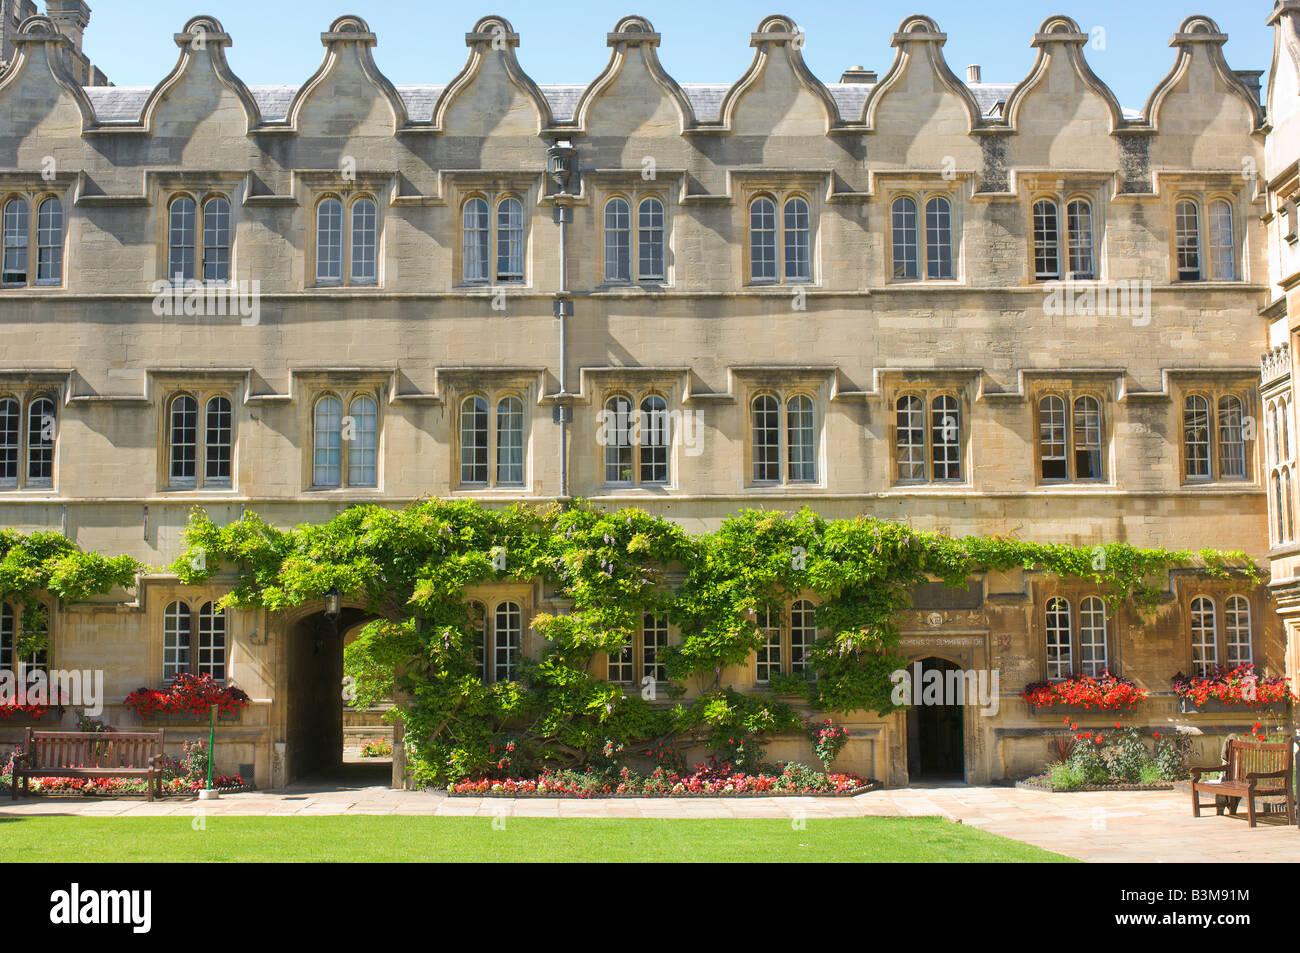 Summer sunshine on the quadrangle at Jesus college, university of Oxford, England. - Stock Image